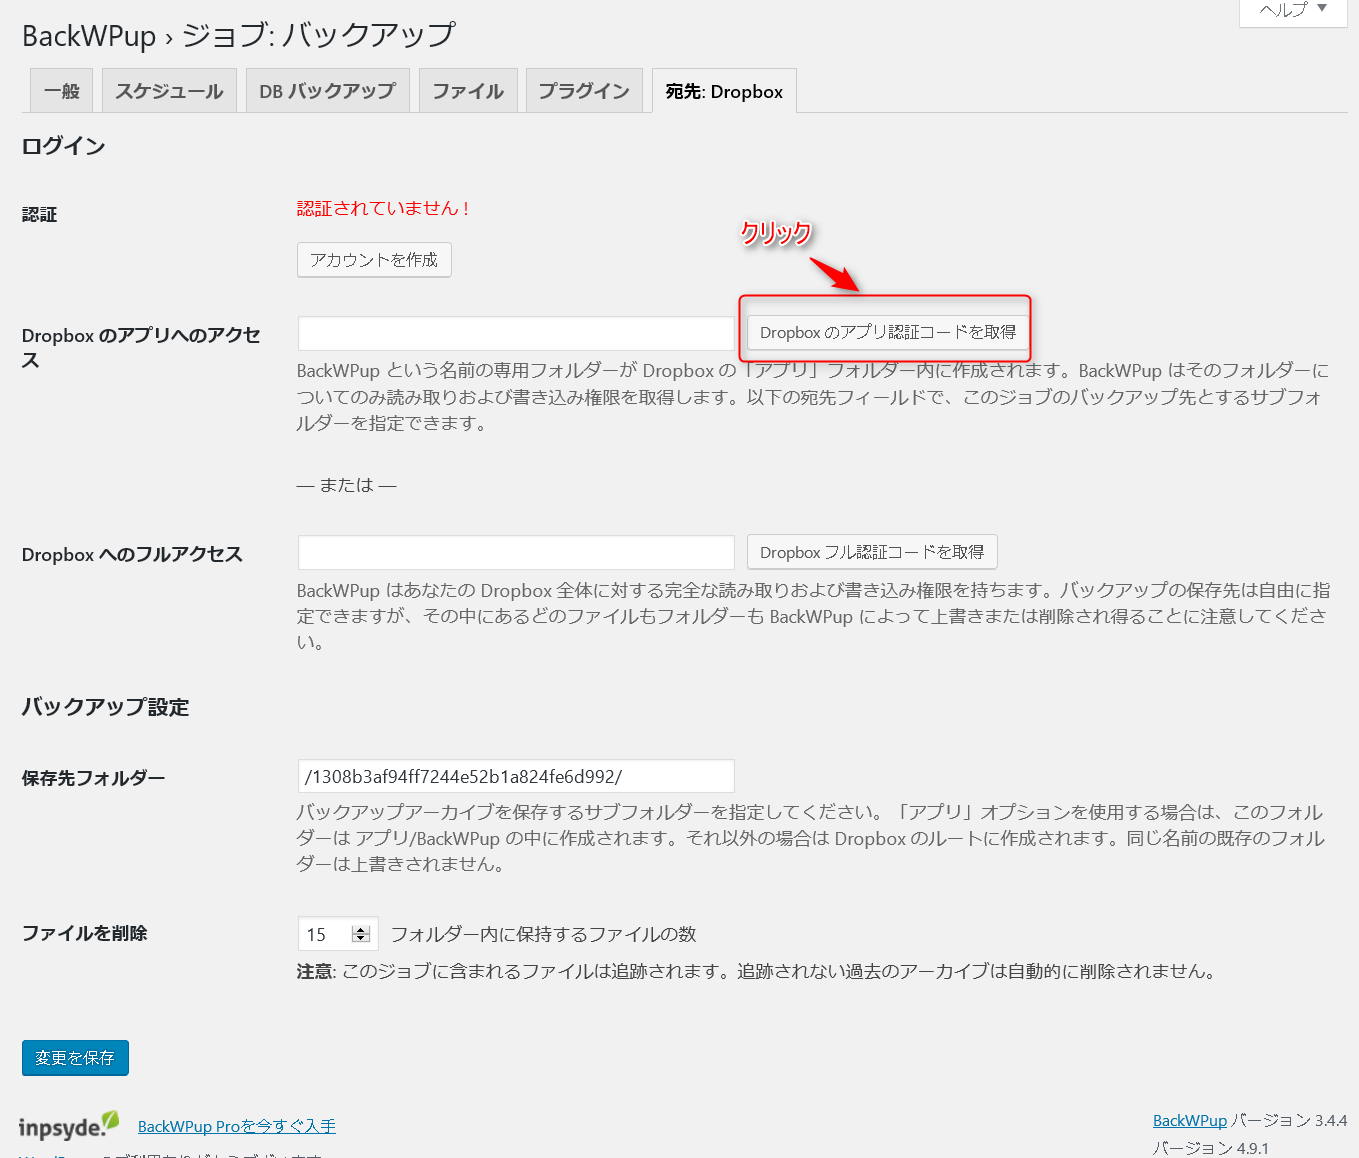 Dropboxのアプリ認証コードを取得